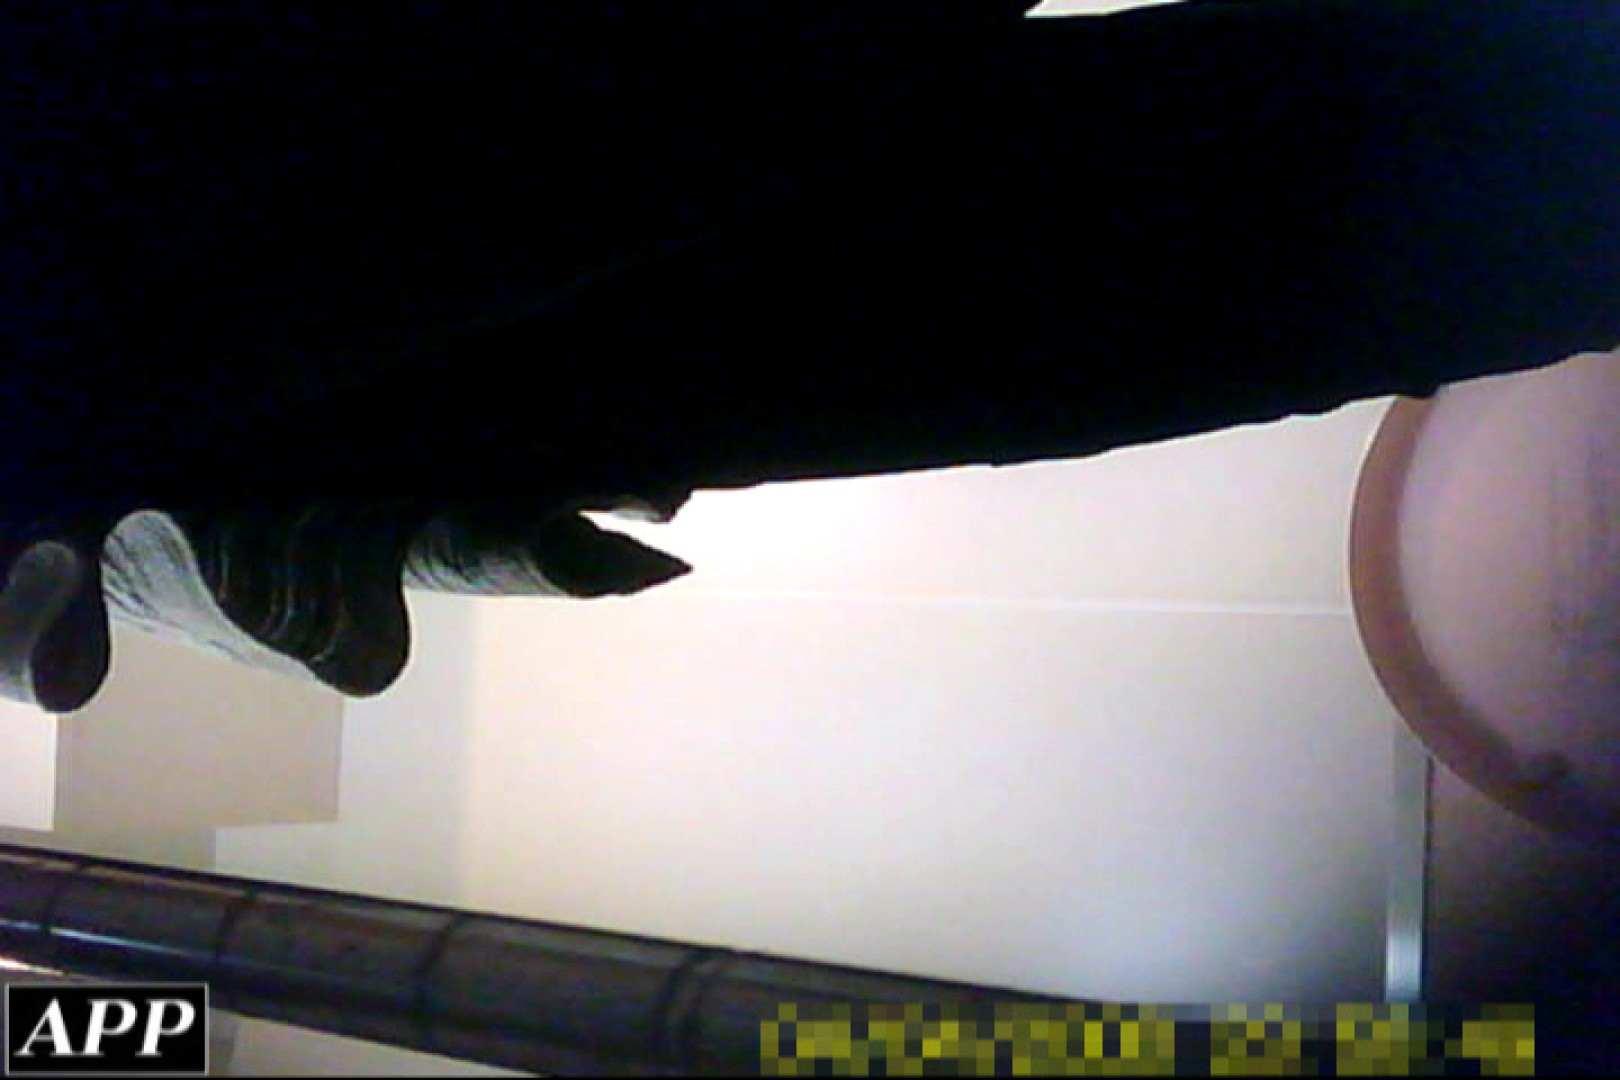 3視点洗面所 vol.023 洗面所 | OLセックス  85画像 65